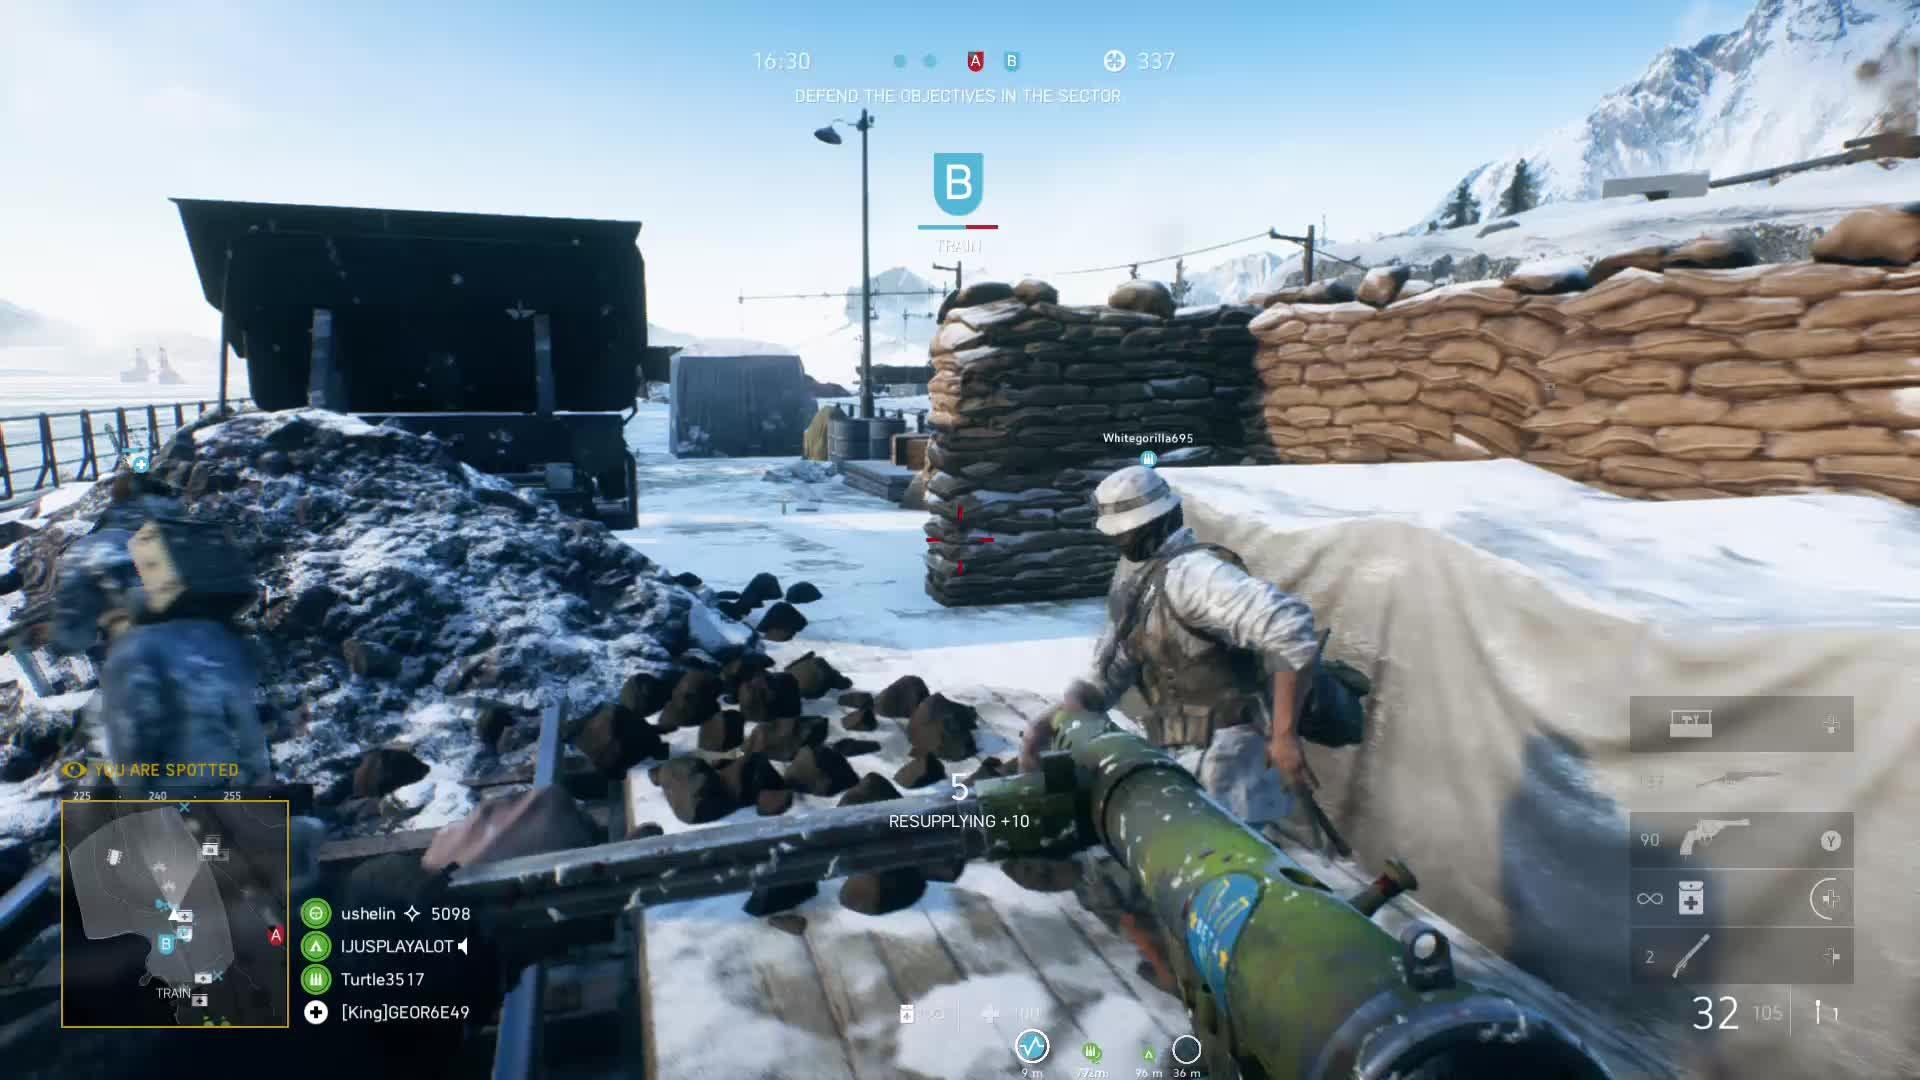 Battlefield: General - Medic Op video cover image 0